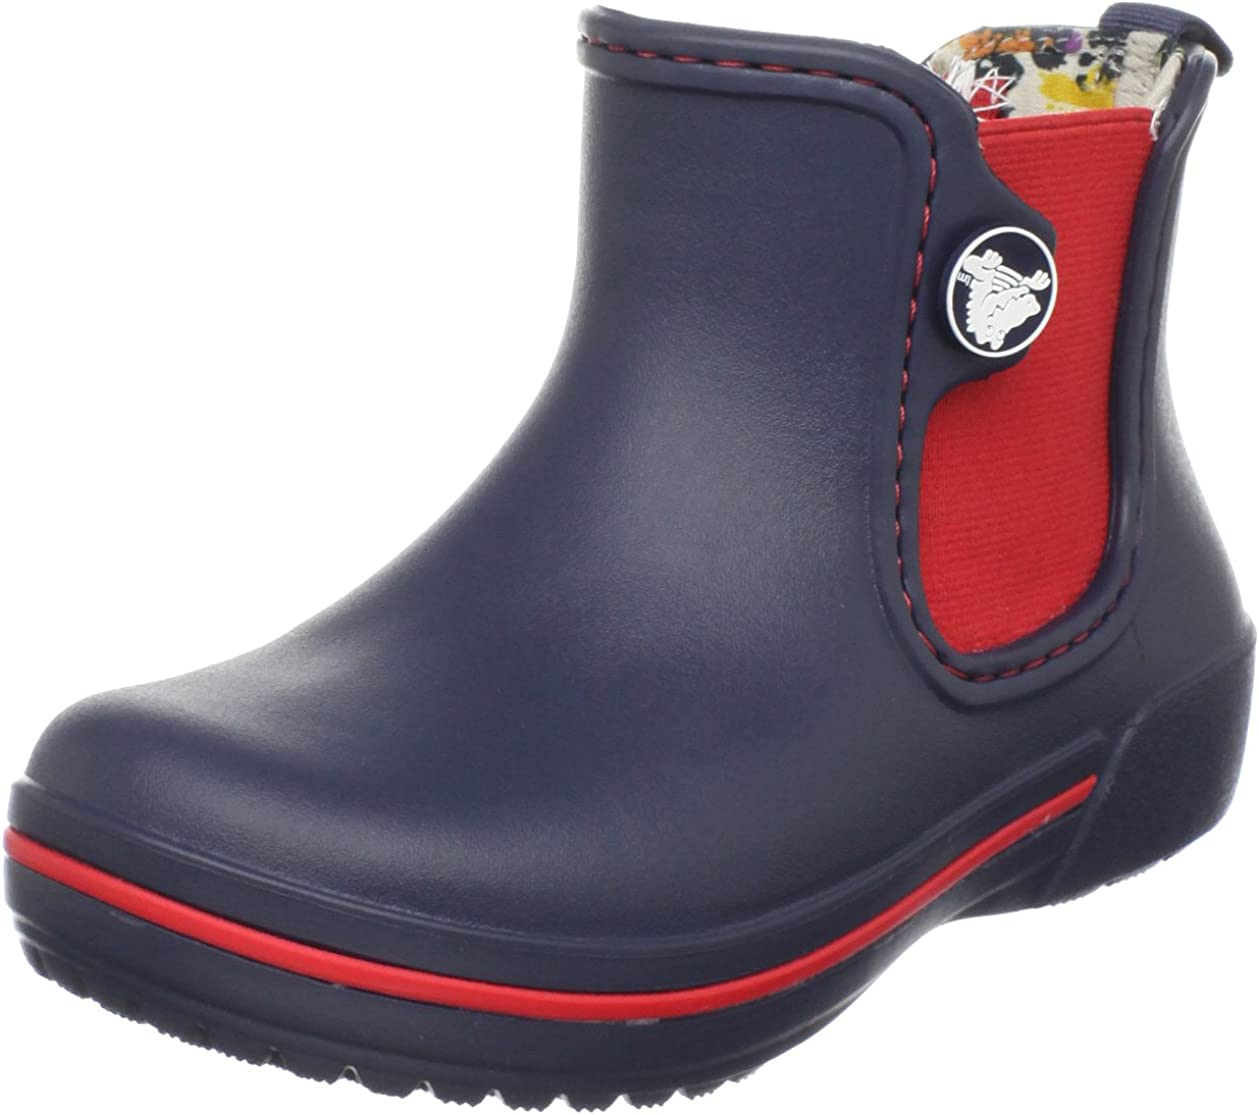 Crocs Kids' Max 72% OFF Crocband Boot Lined Hi Cheap sale